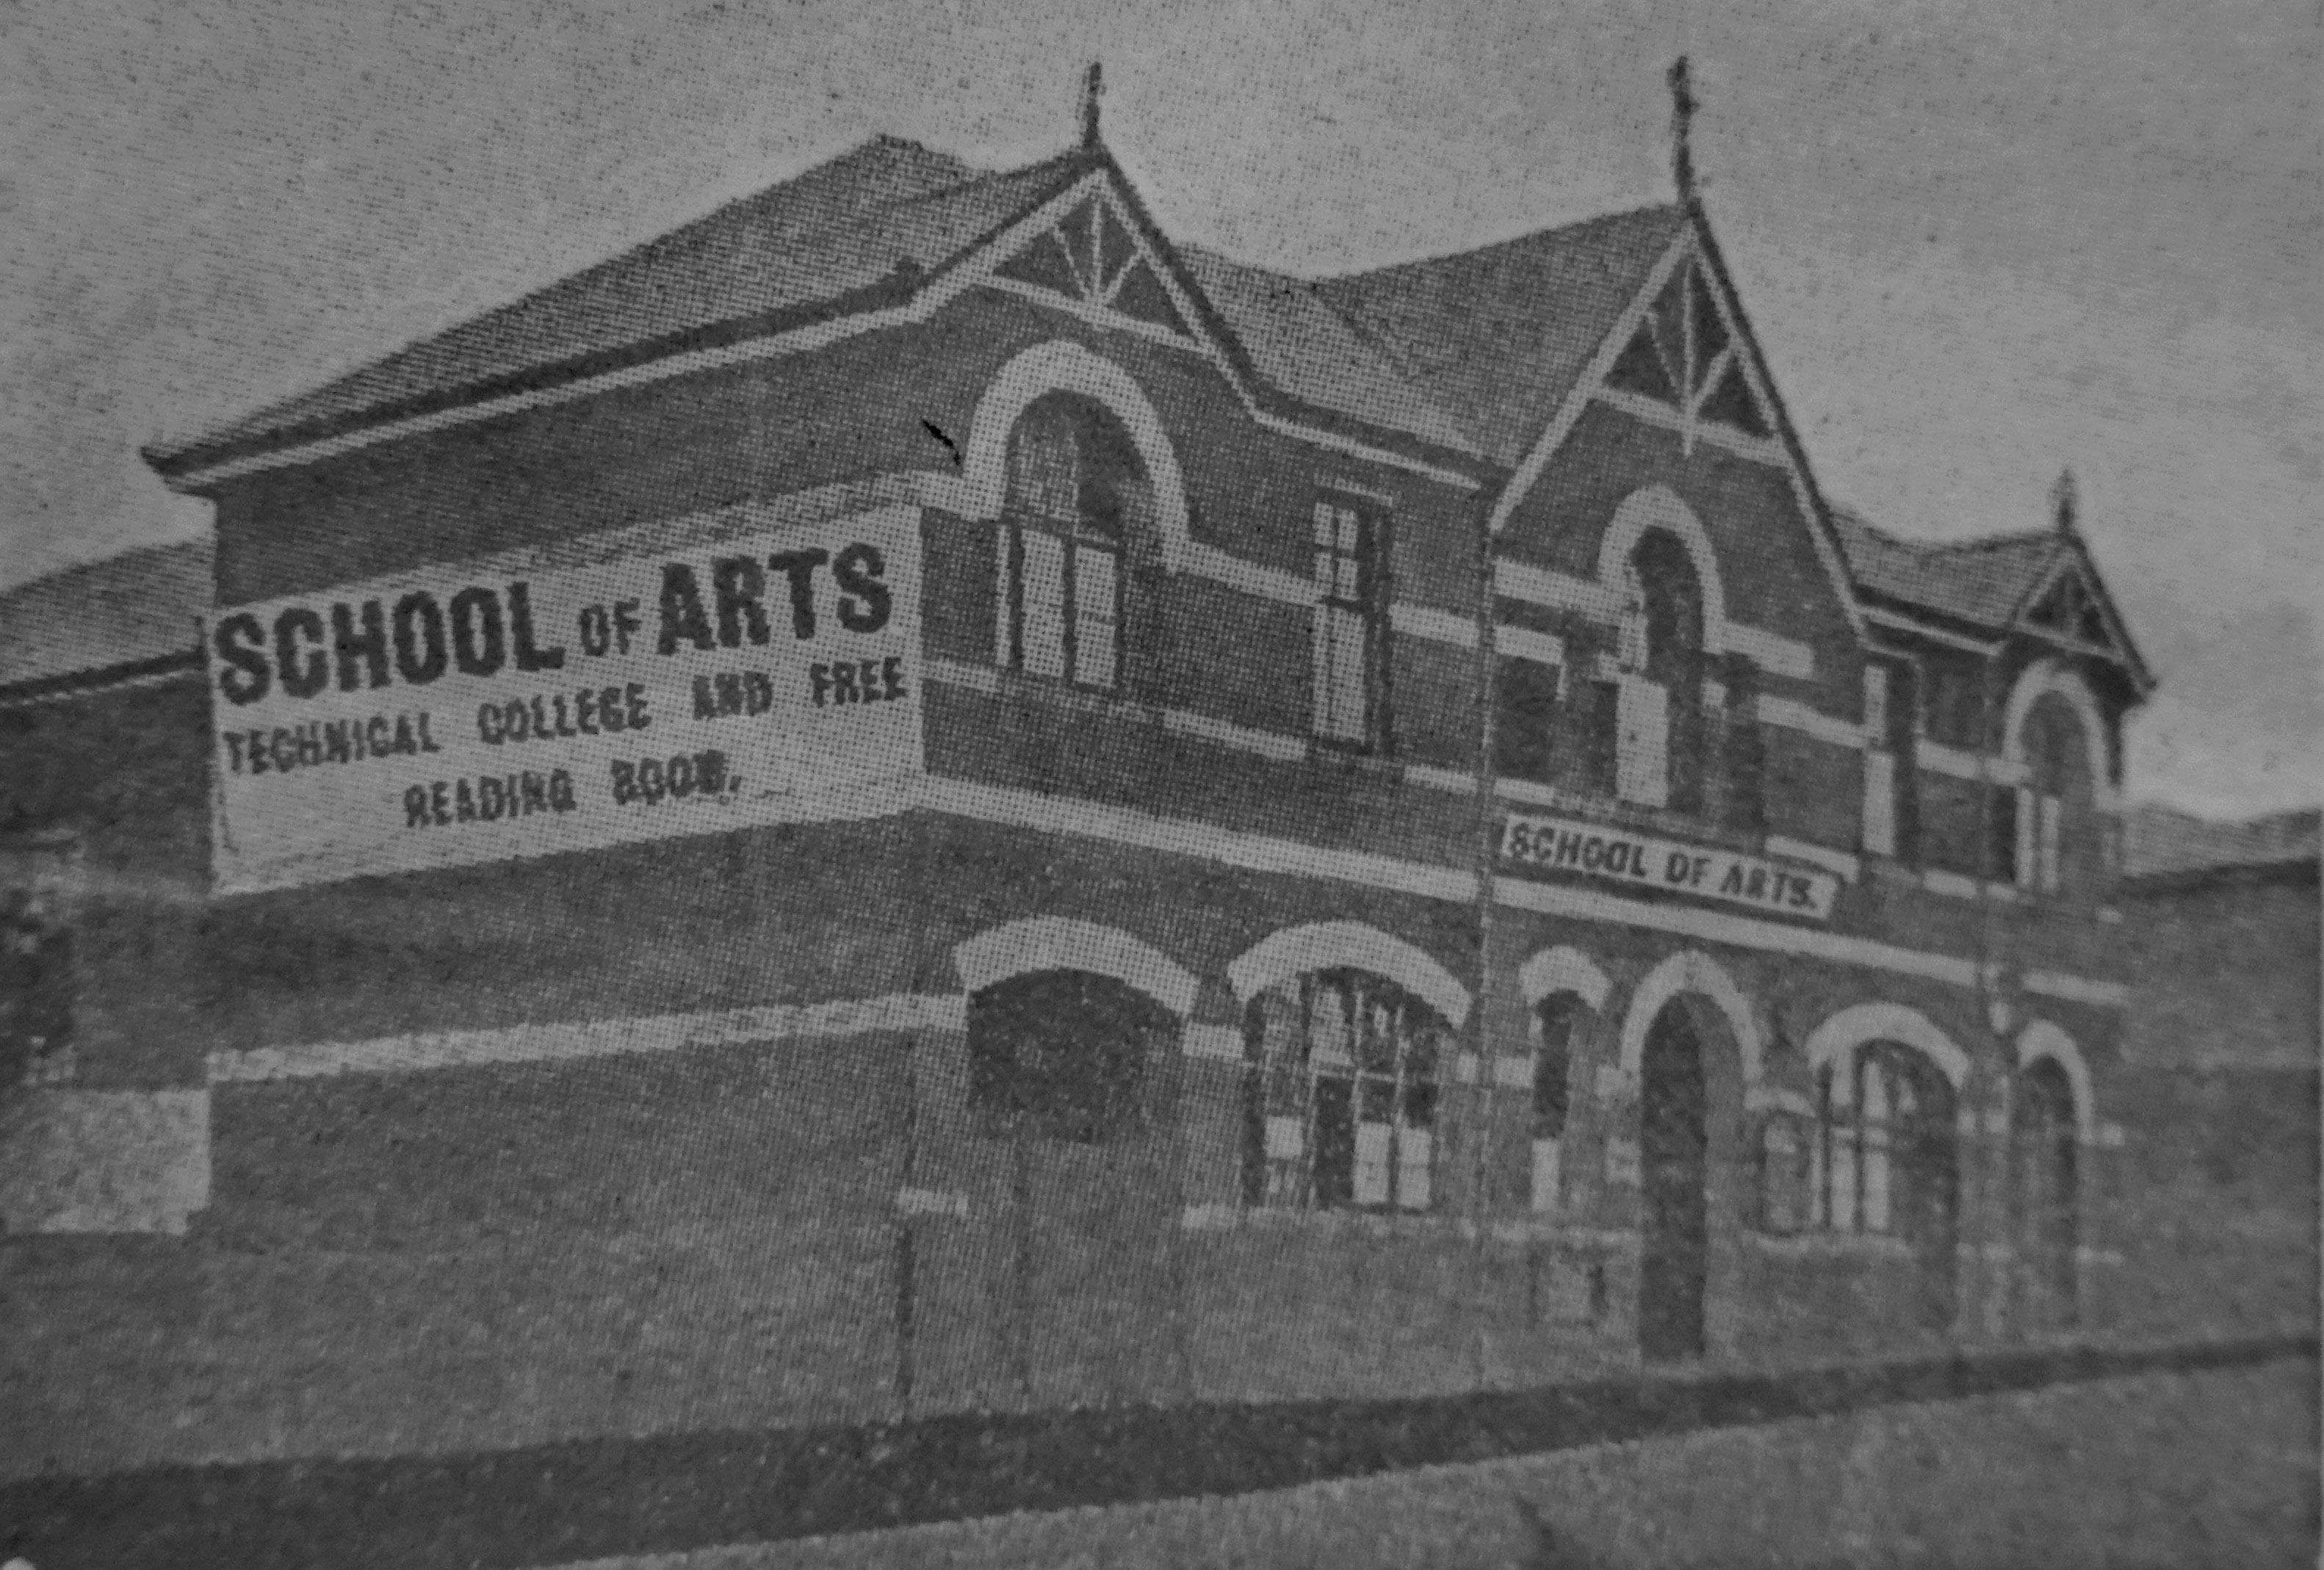 school arts west end letterhead image 1907 bw